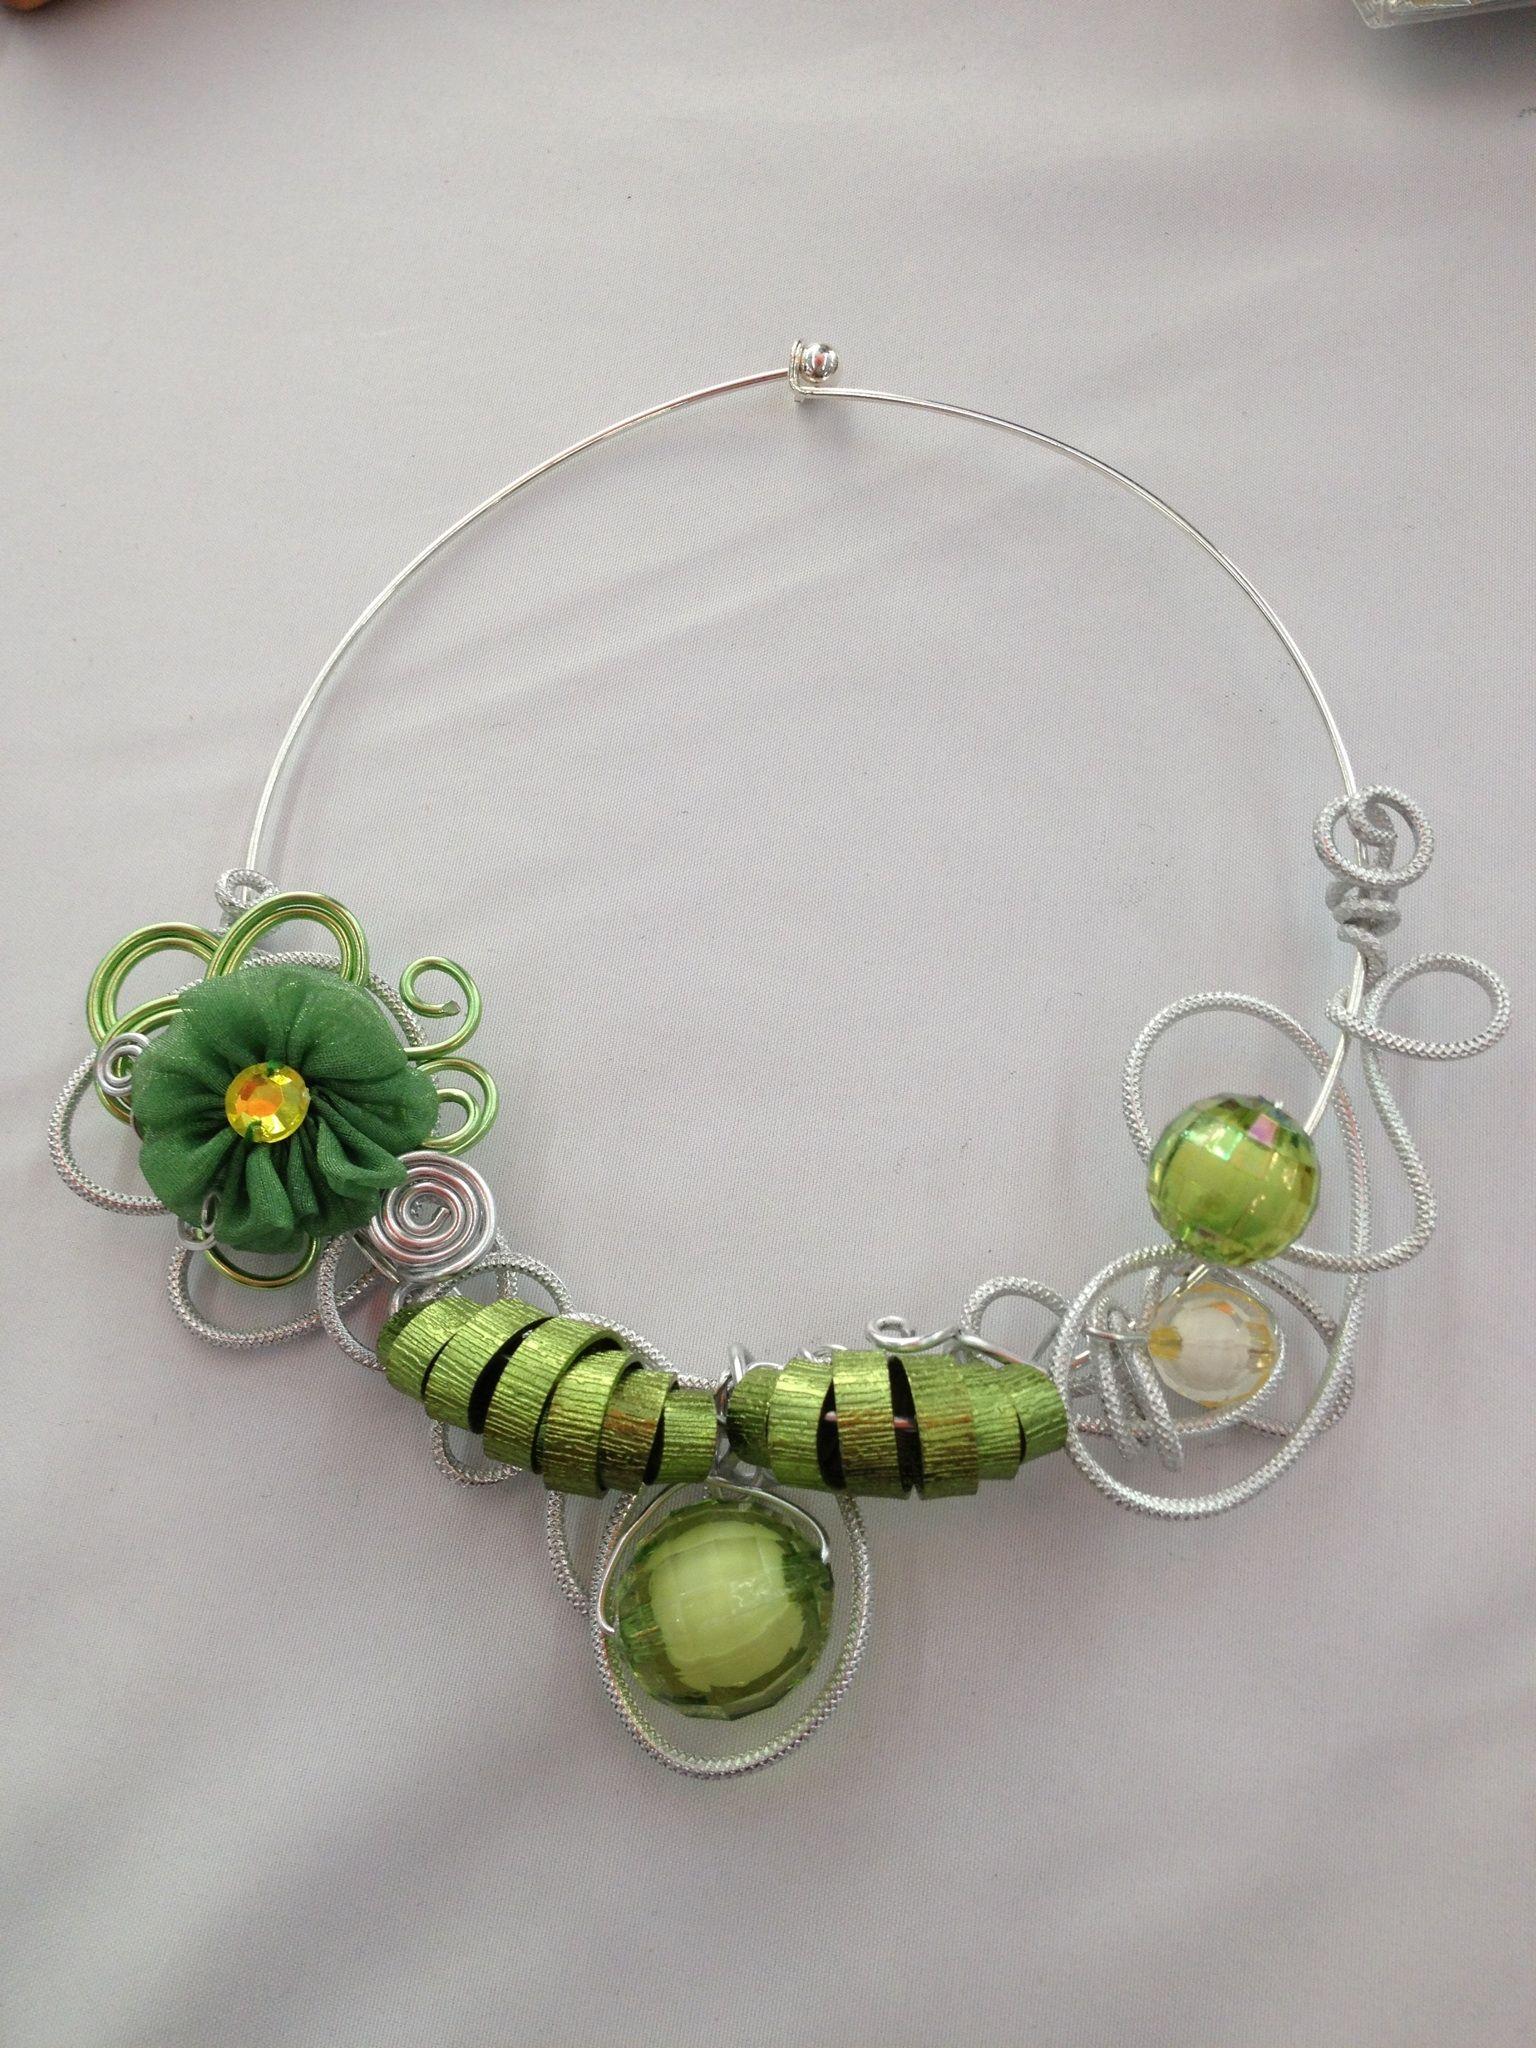 Collier fil alu | Aluminium wire jewelry | Pinterest | Aluminum wire ...